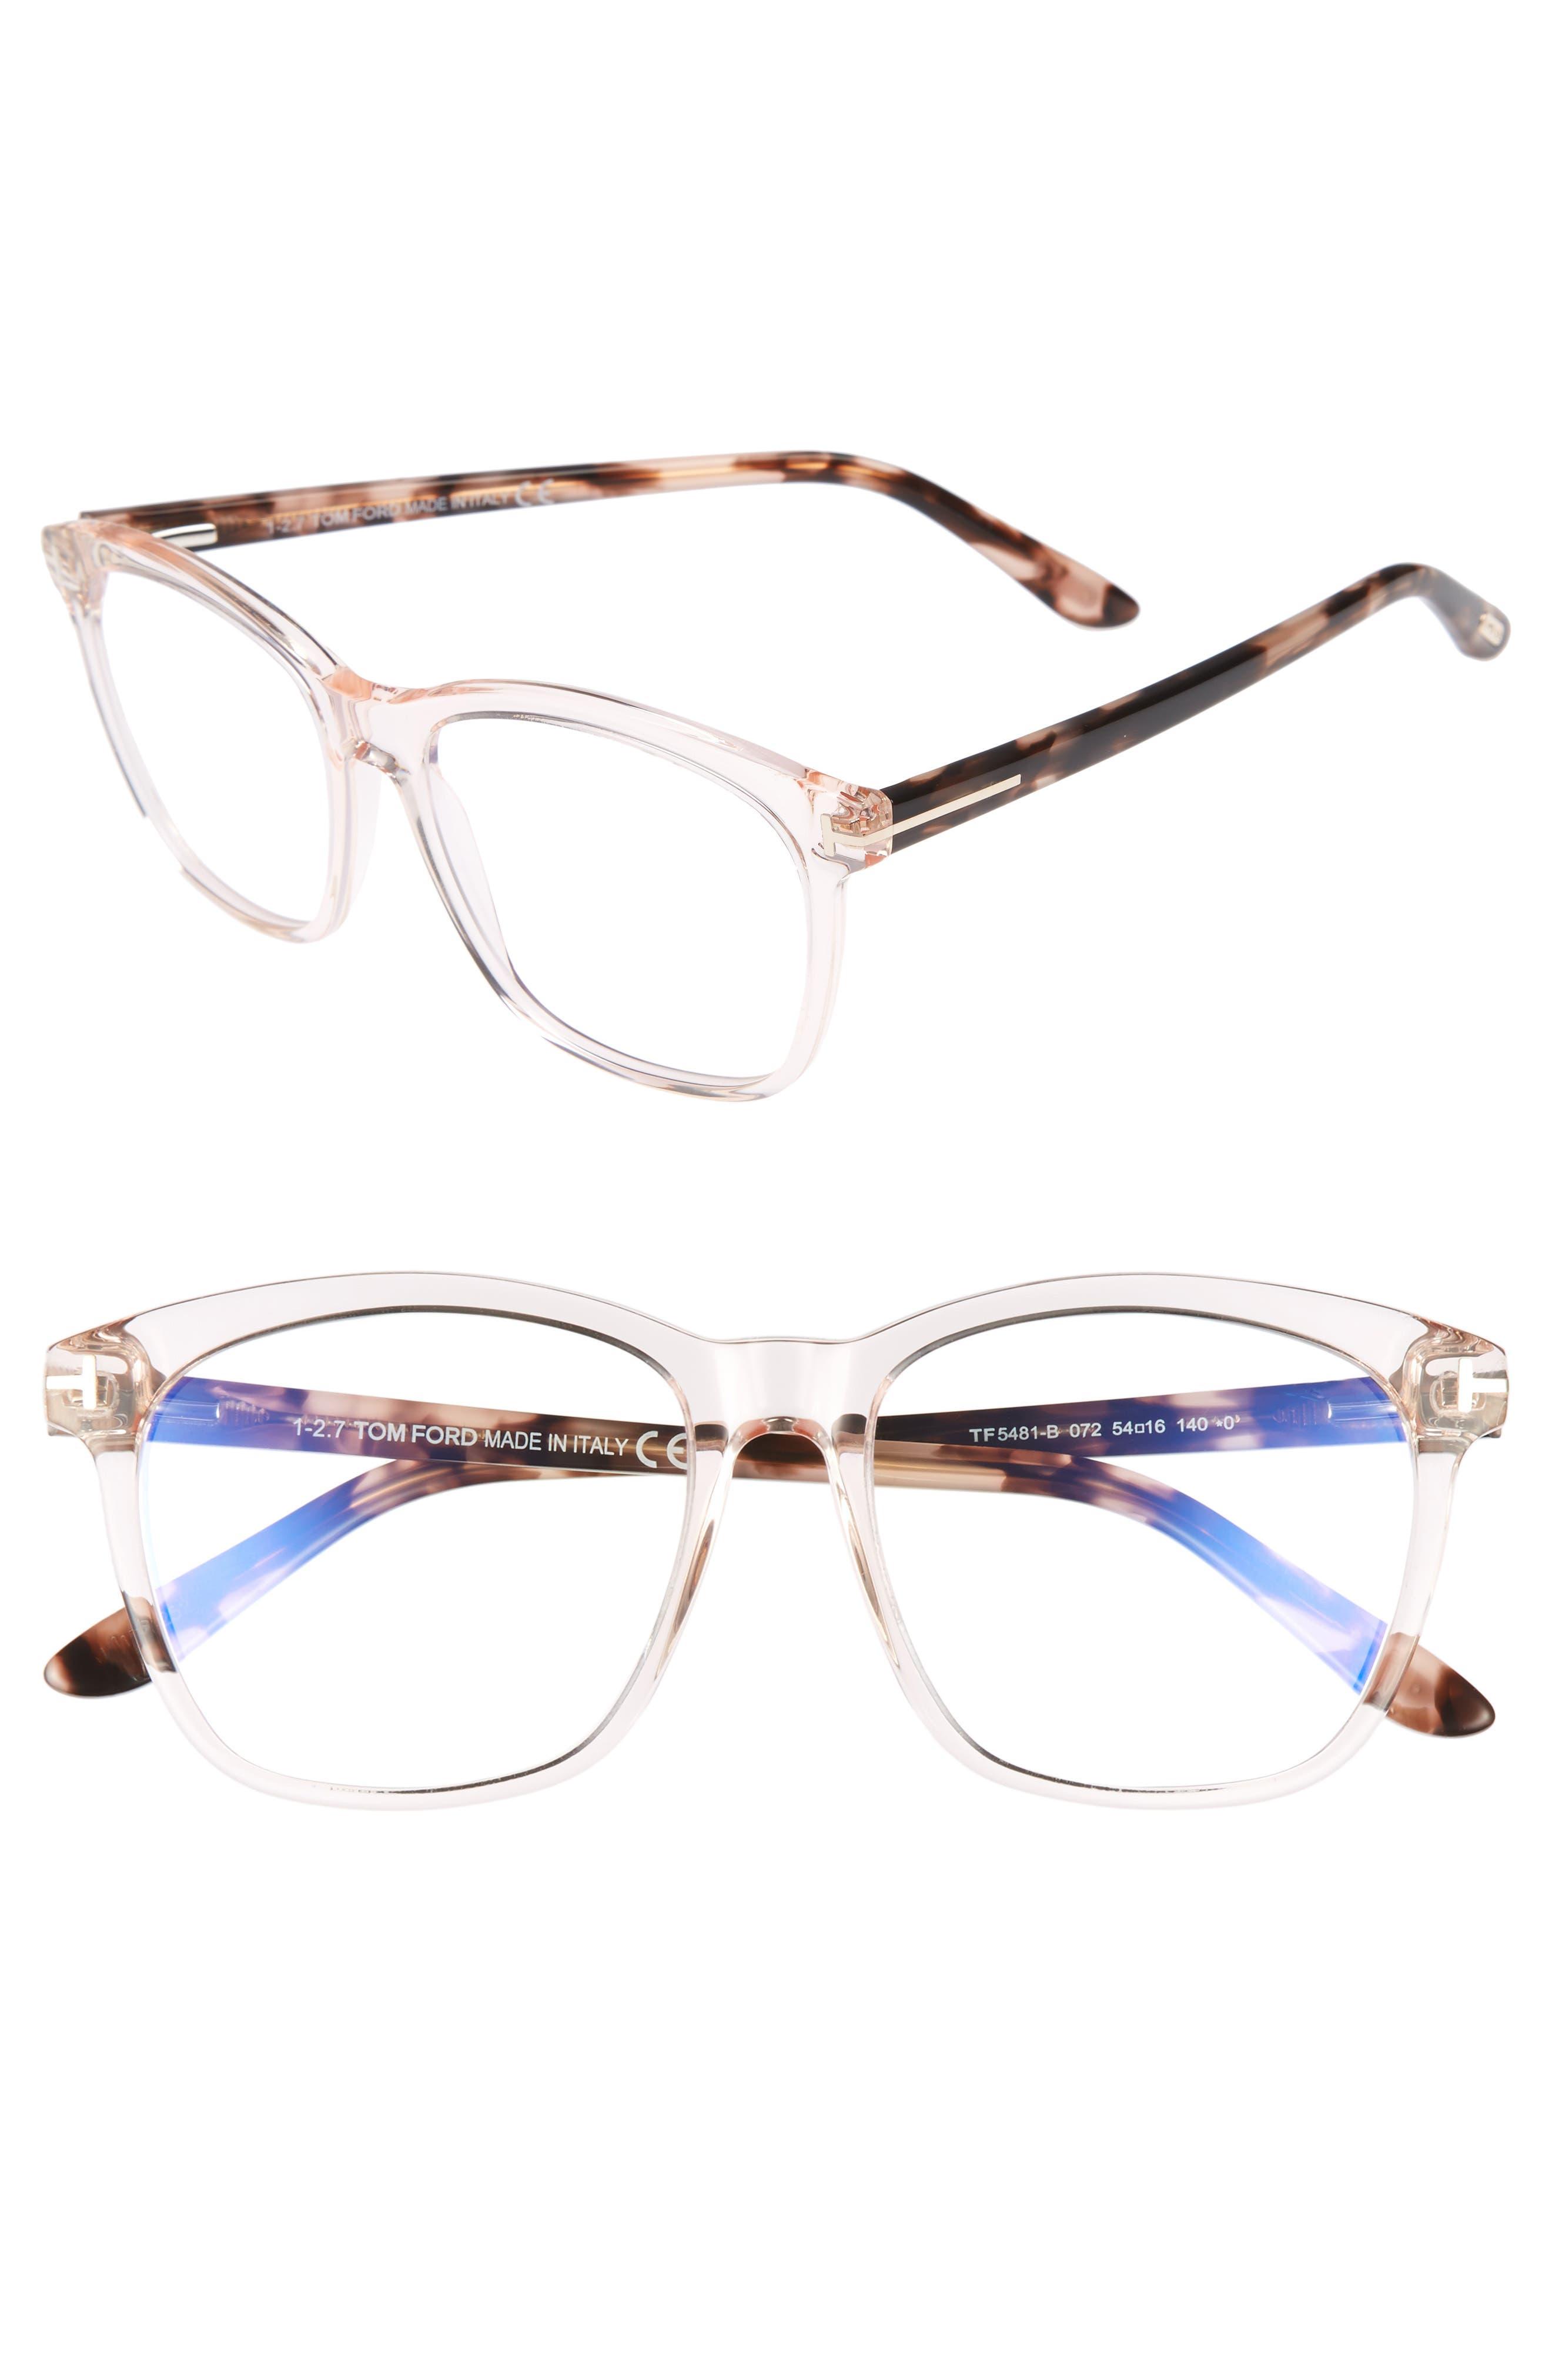 54mm Blue Block Optical Glasses,                             Main thumbnail 1, color,                             Shiny Pink/ Vintage Havana